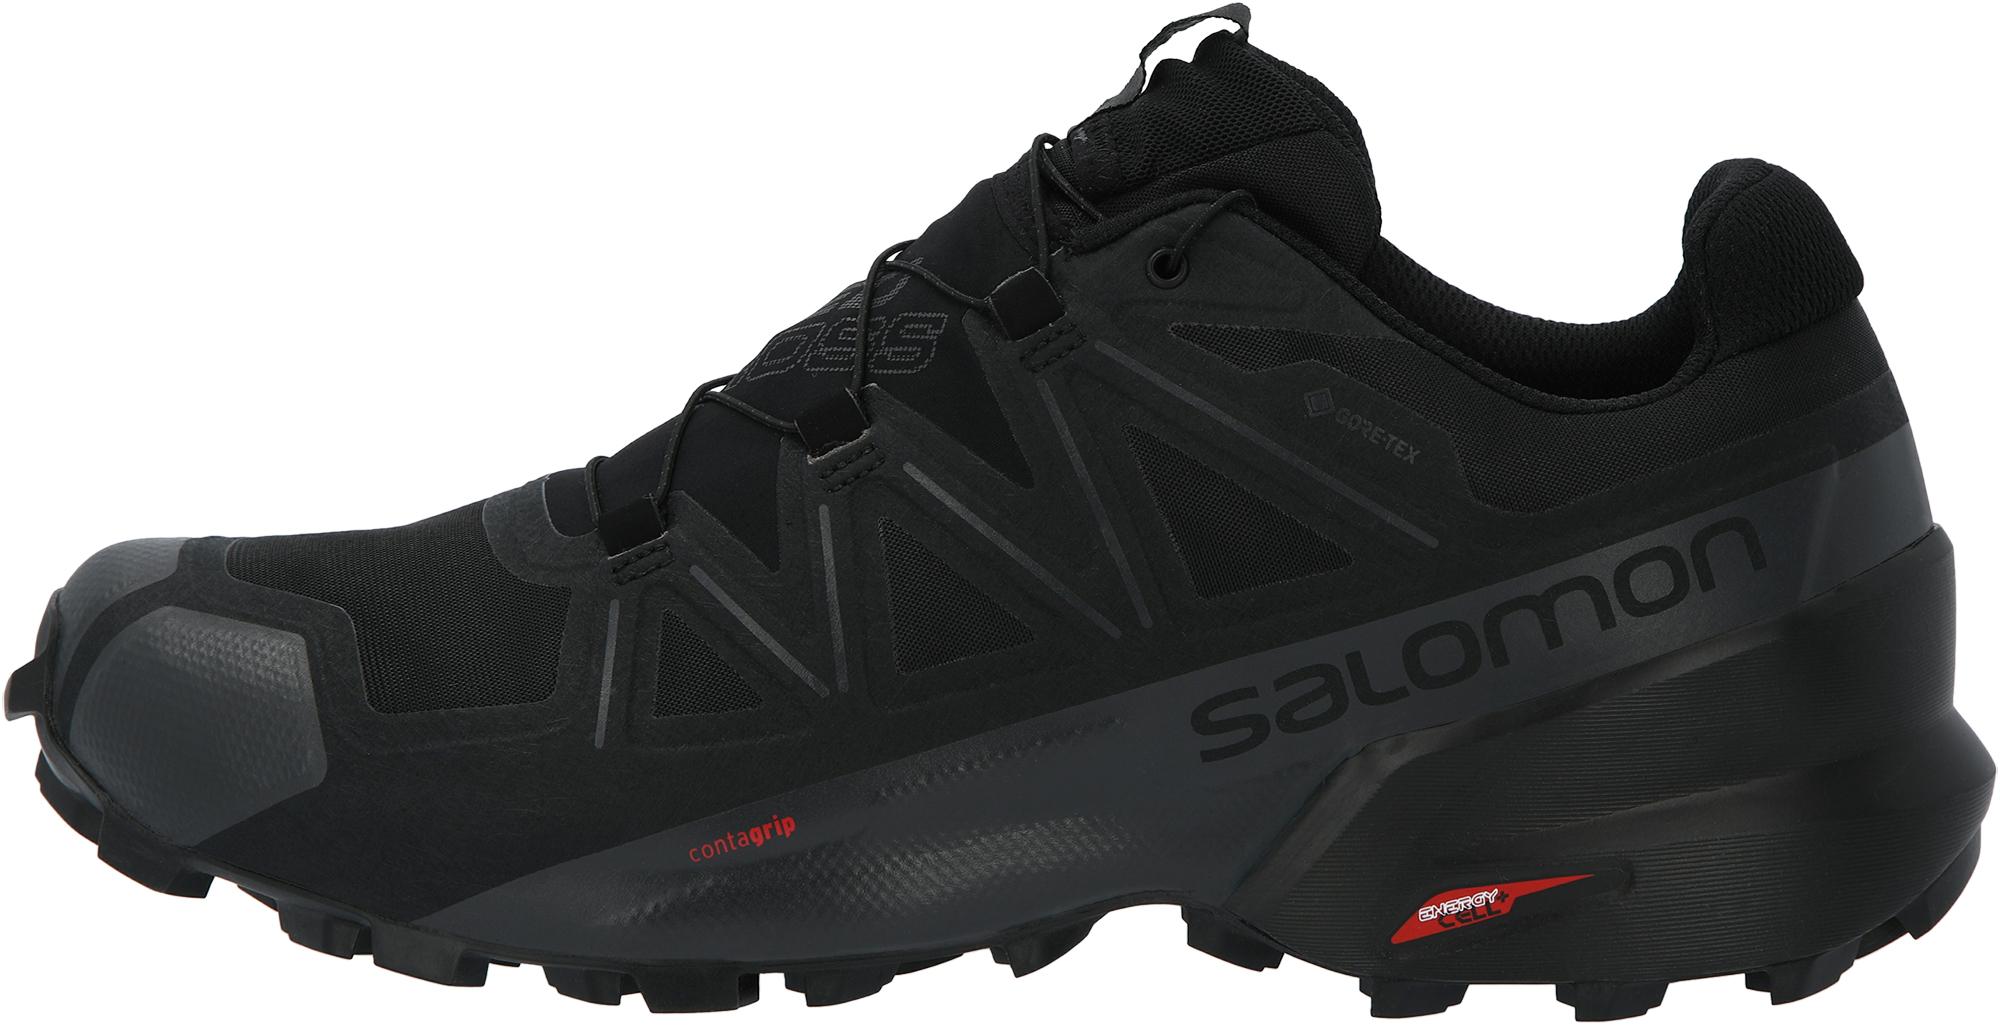 цена на Salomon Кроссовки мужские Salomon Speedcross 5 GTX, размер 46.5